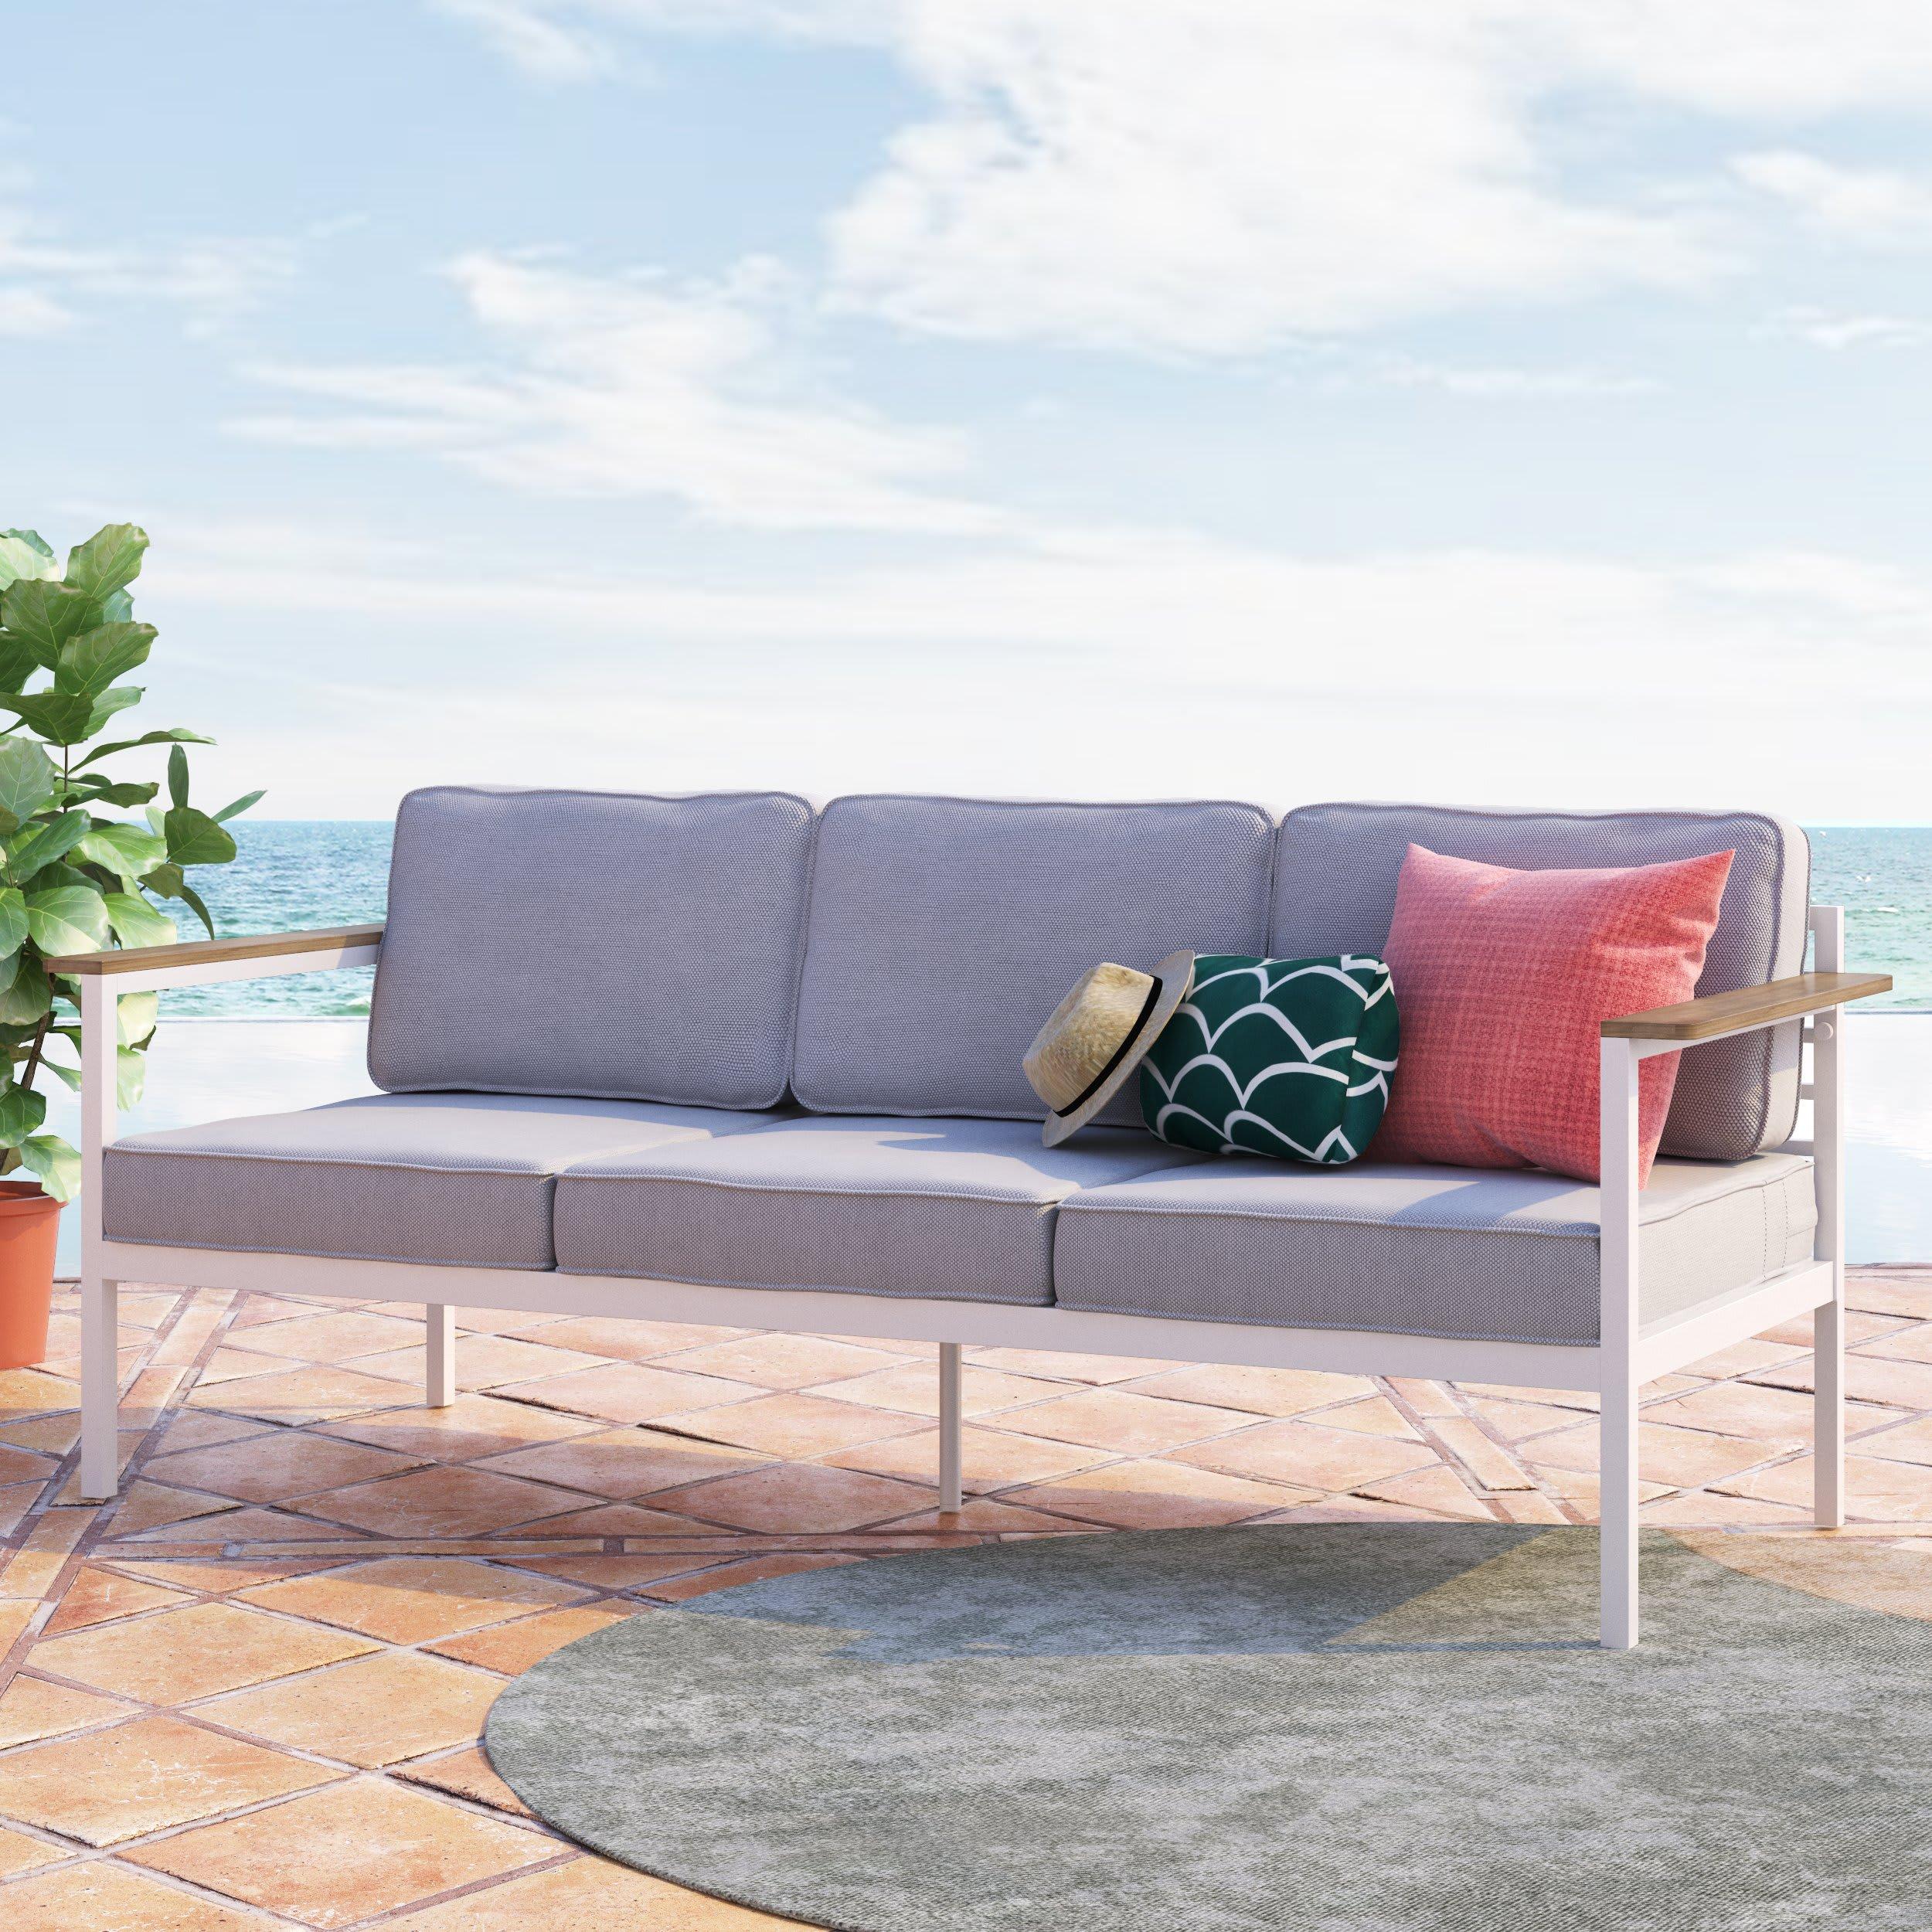 Pablo Aluminum and Acacia Wood Outdoor Sofa